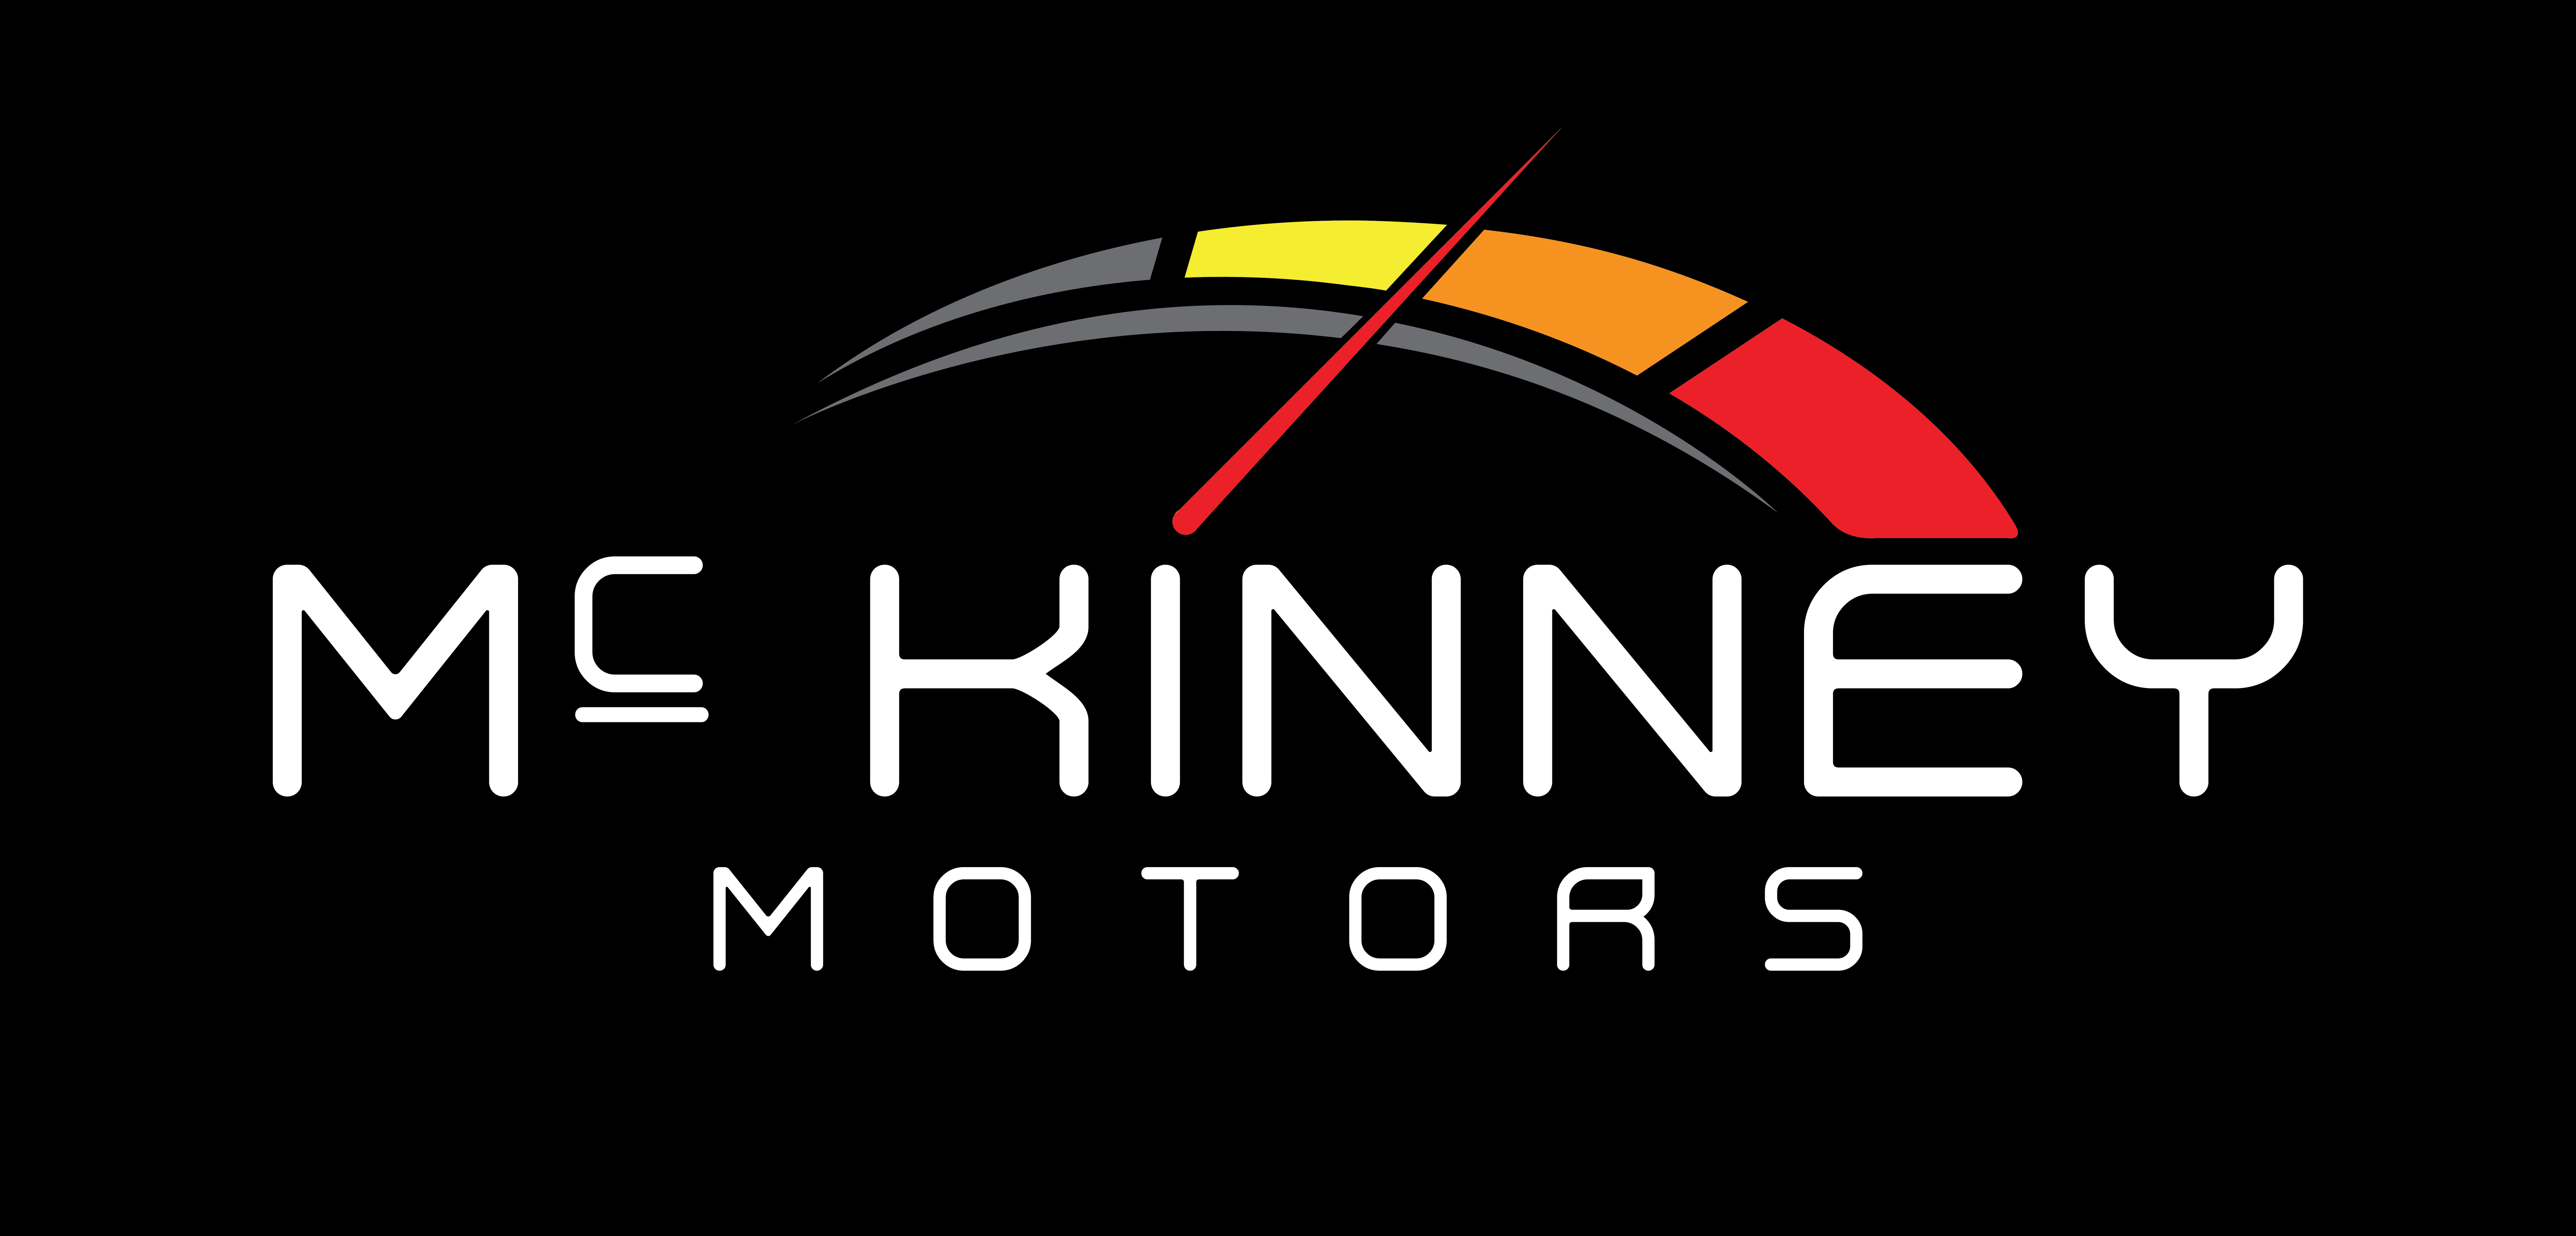 McKinney Motors, Moy